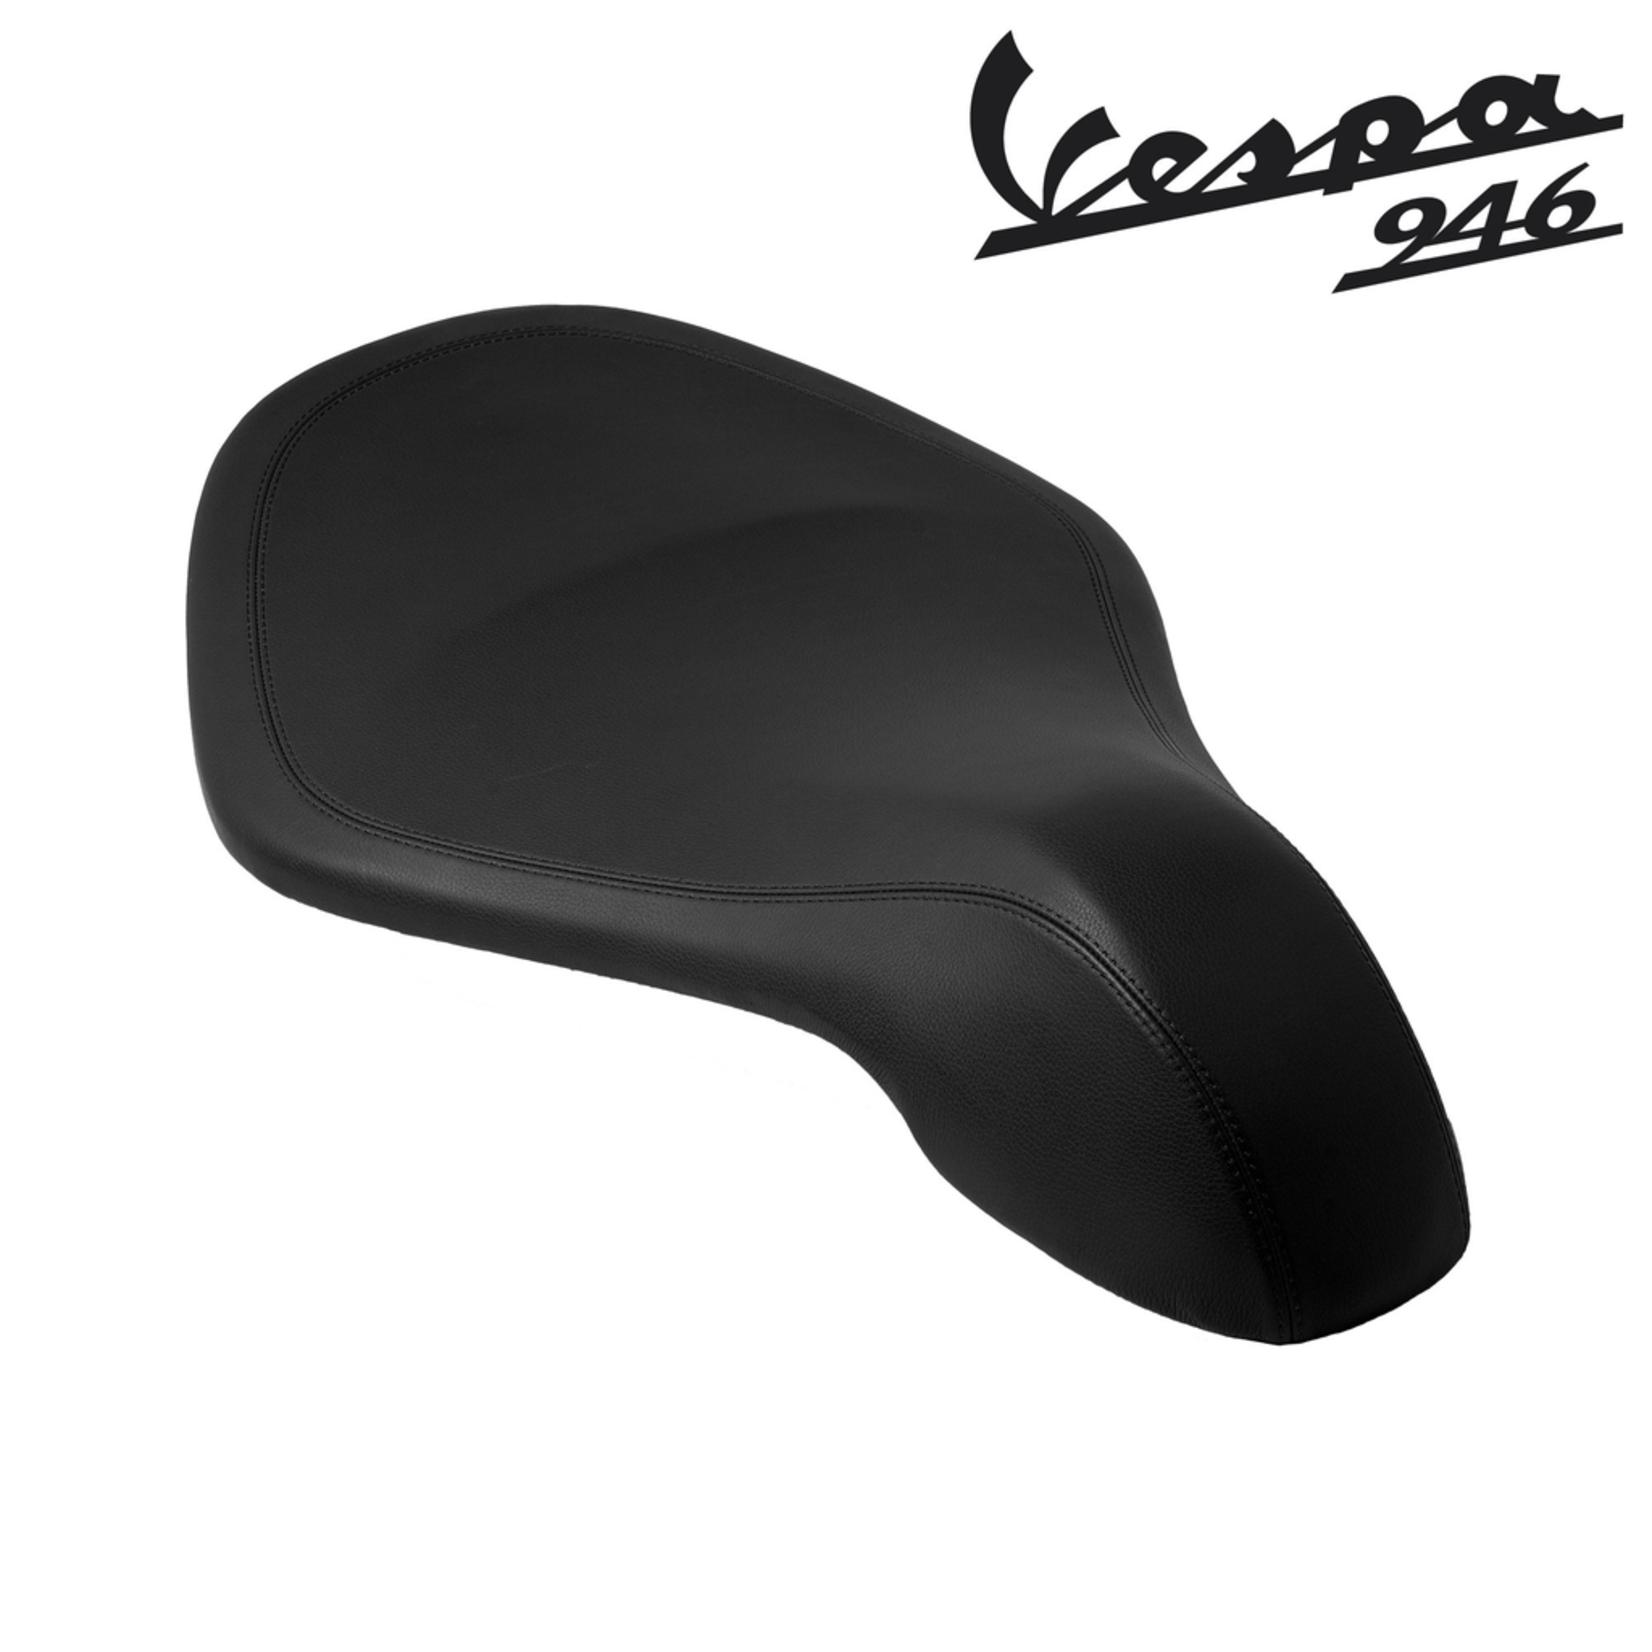 Accessories Saddle, Vespa 946 Black Leather